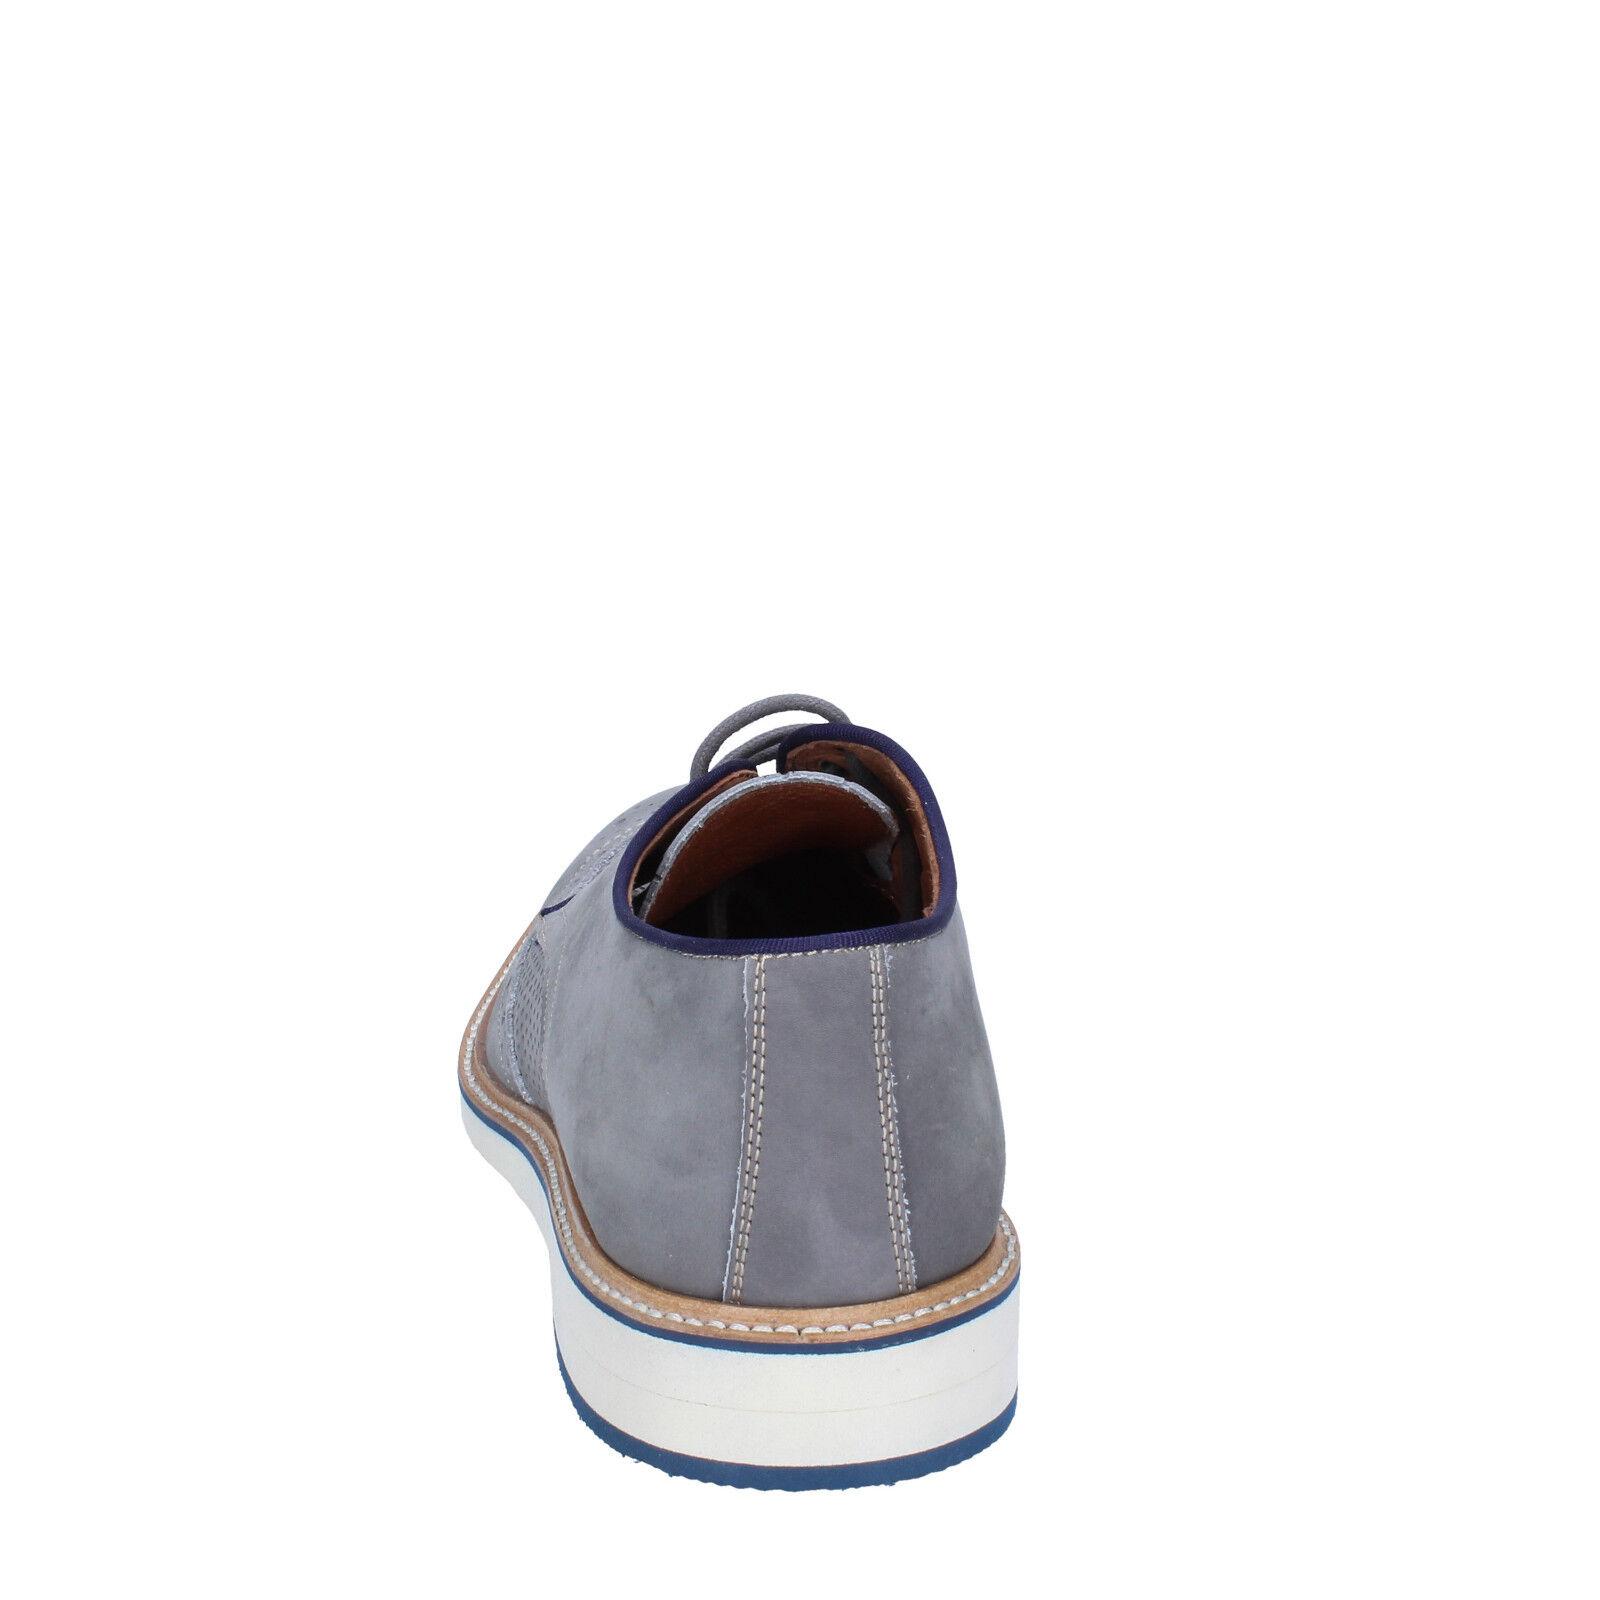 Herren schuhe schuhe schuhe +2 MADE IN ITALY 44 EU elegante grau nabuk BT702-44  aa64a6